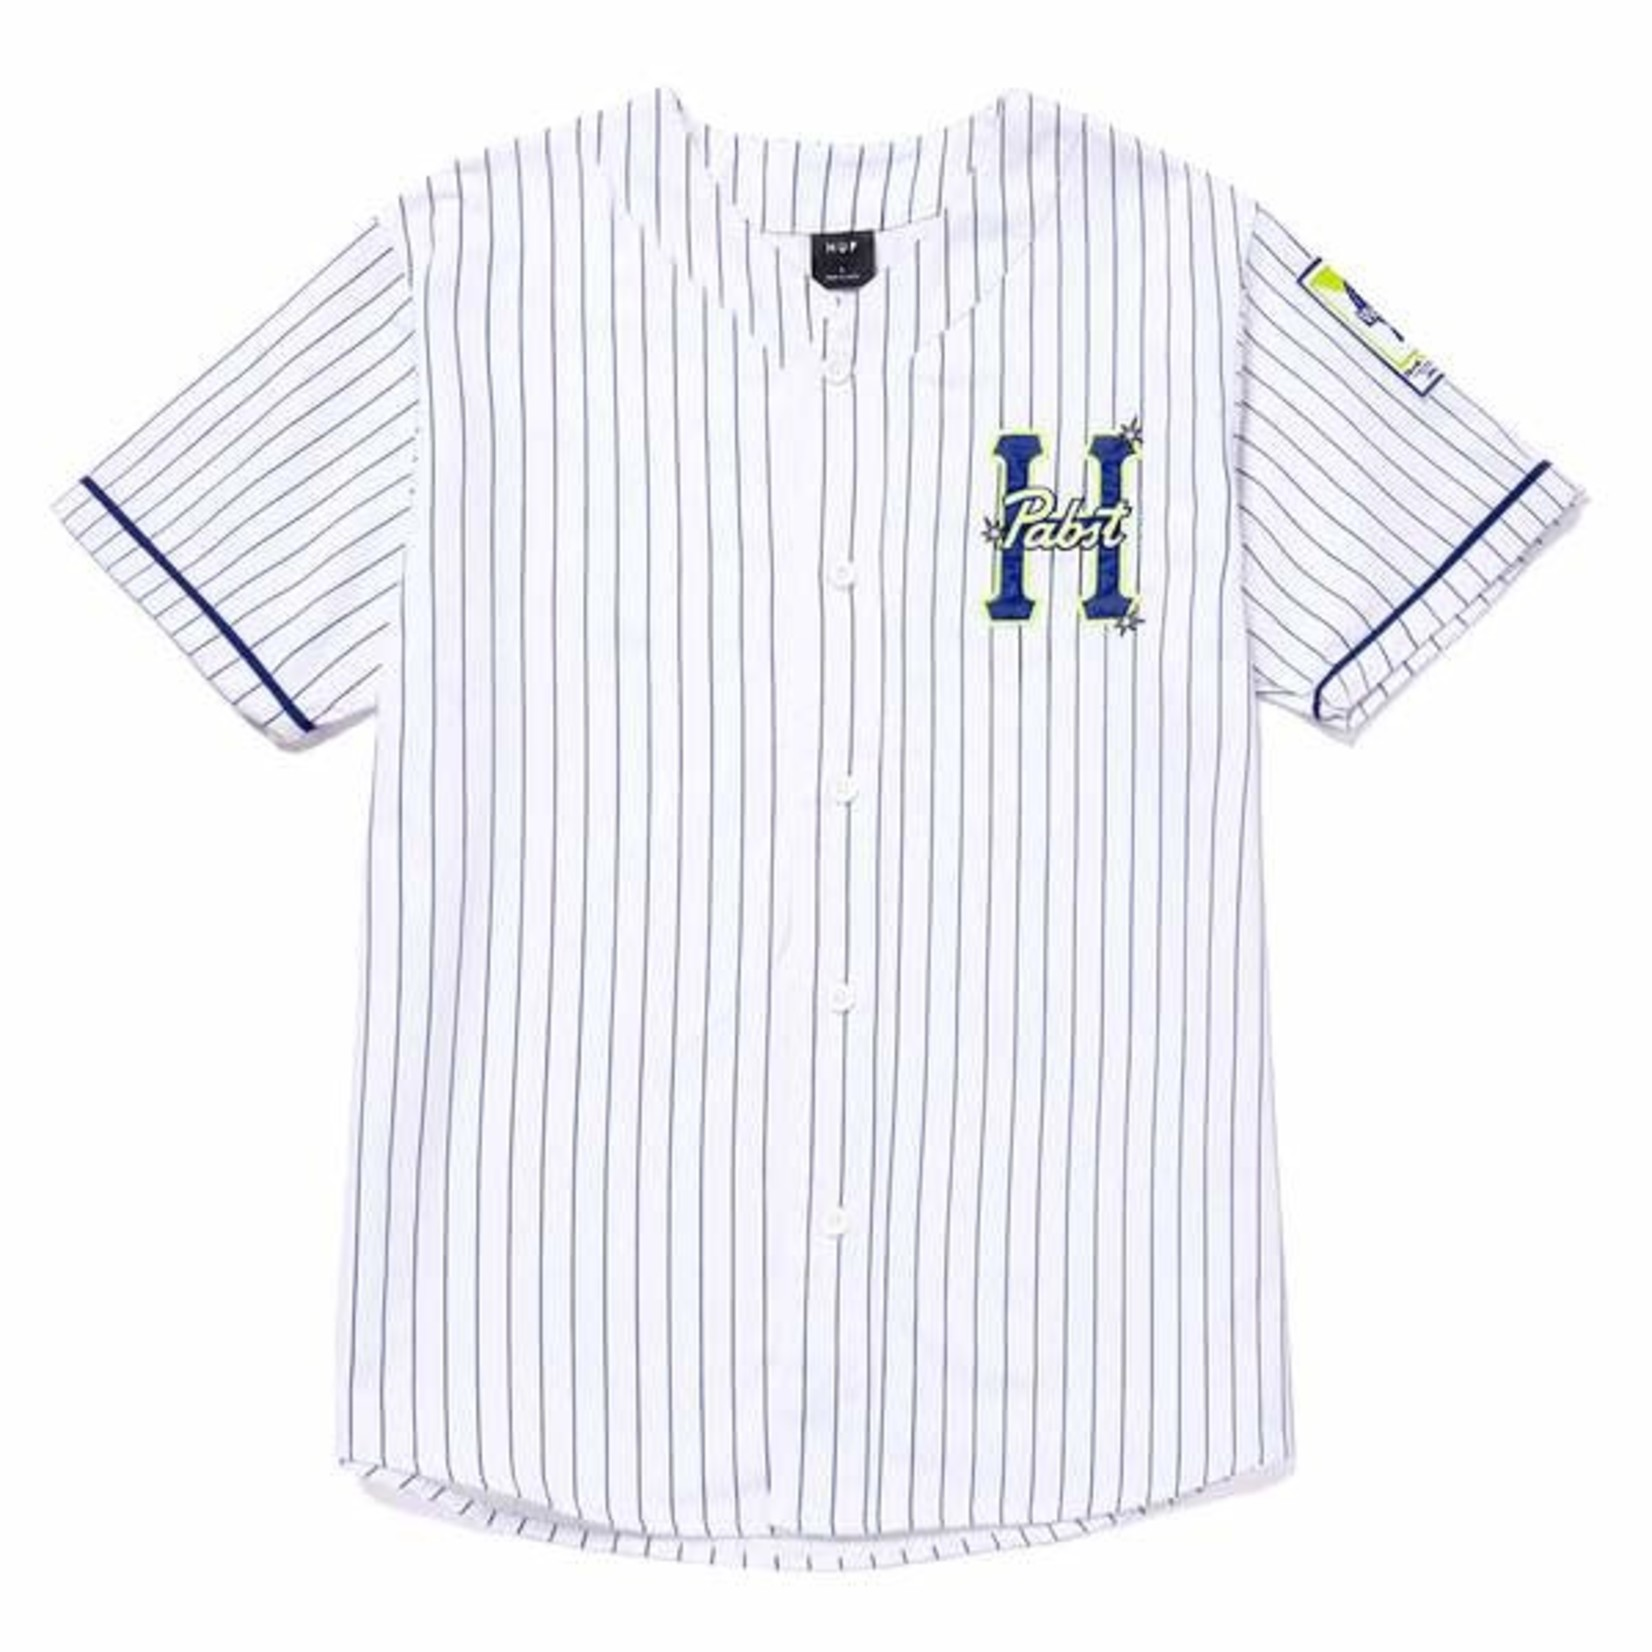 Huf Huf x Pabst Twill Baseball Jersey